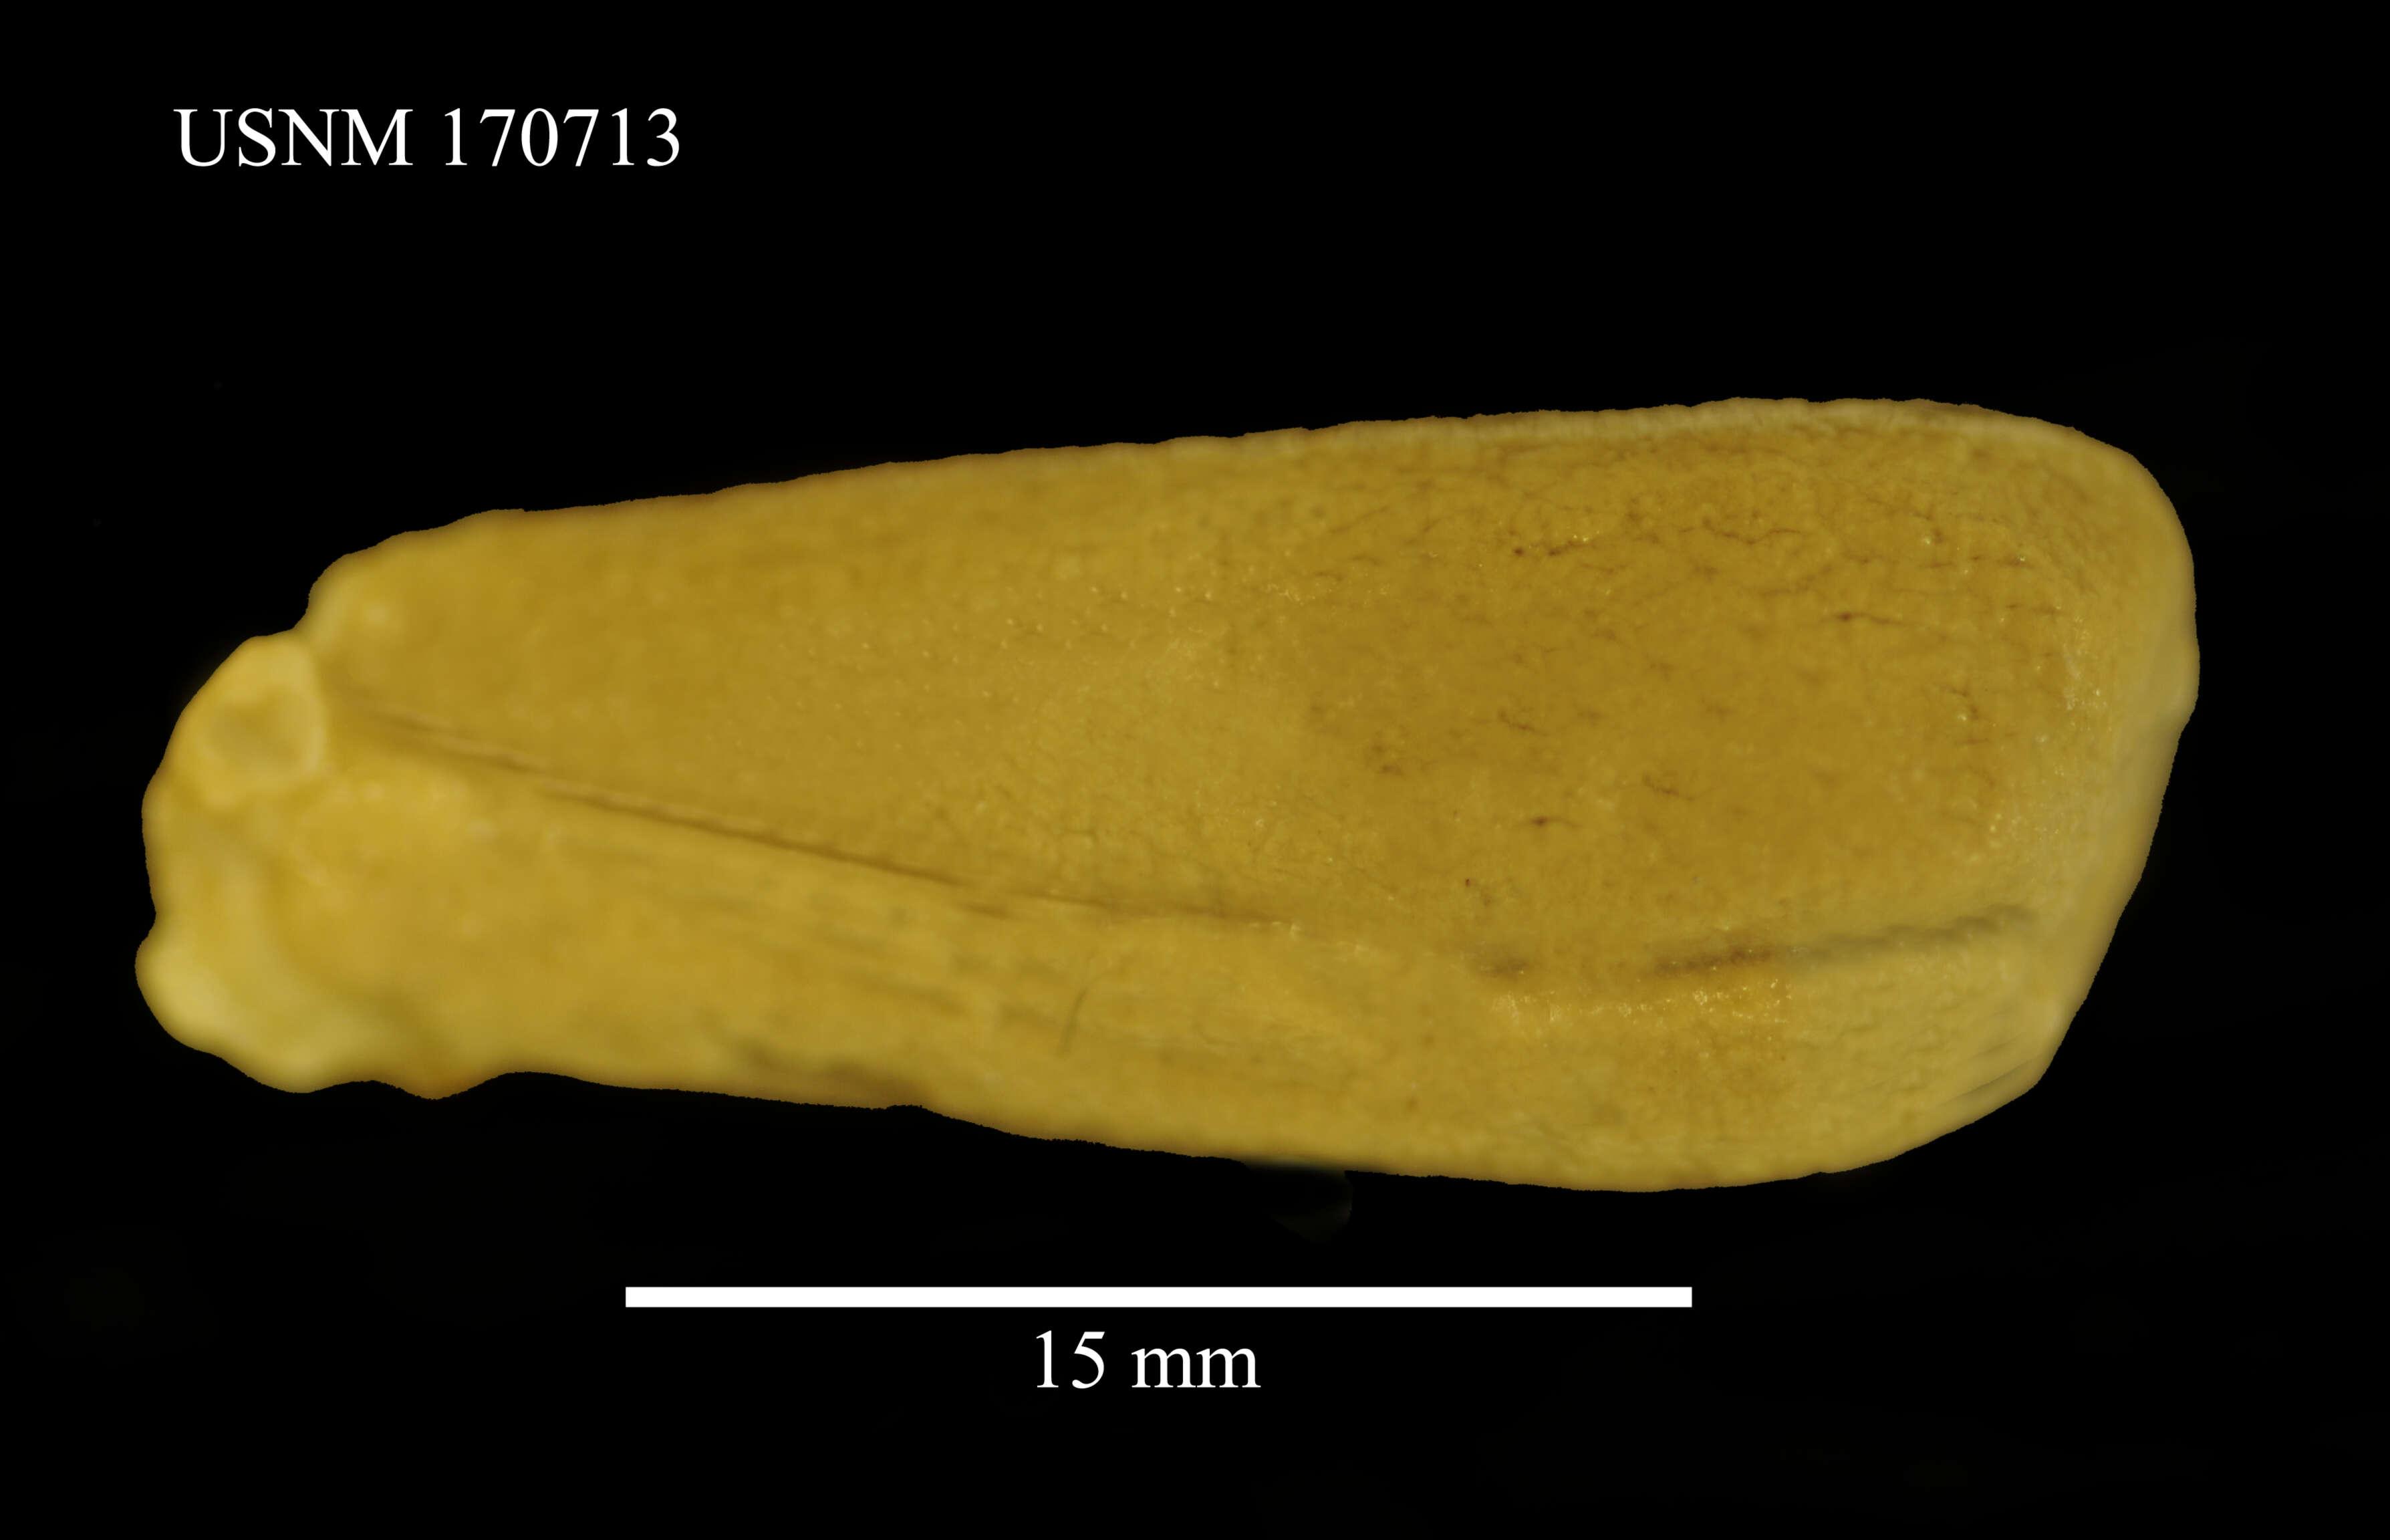 Image of peanut worms